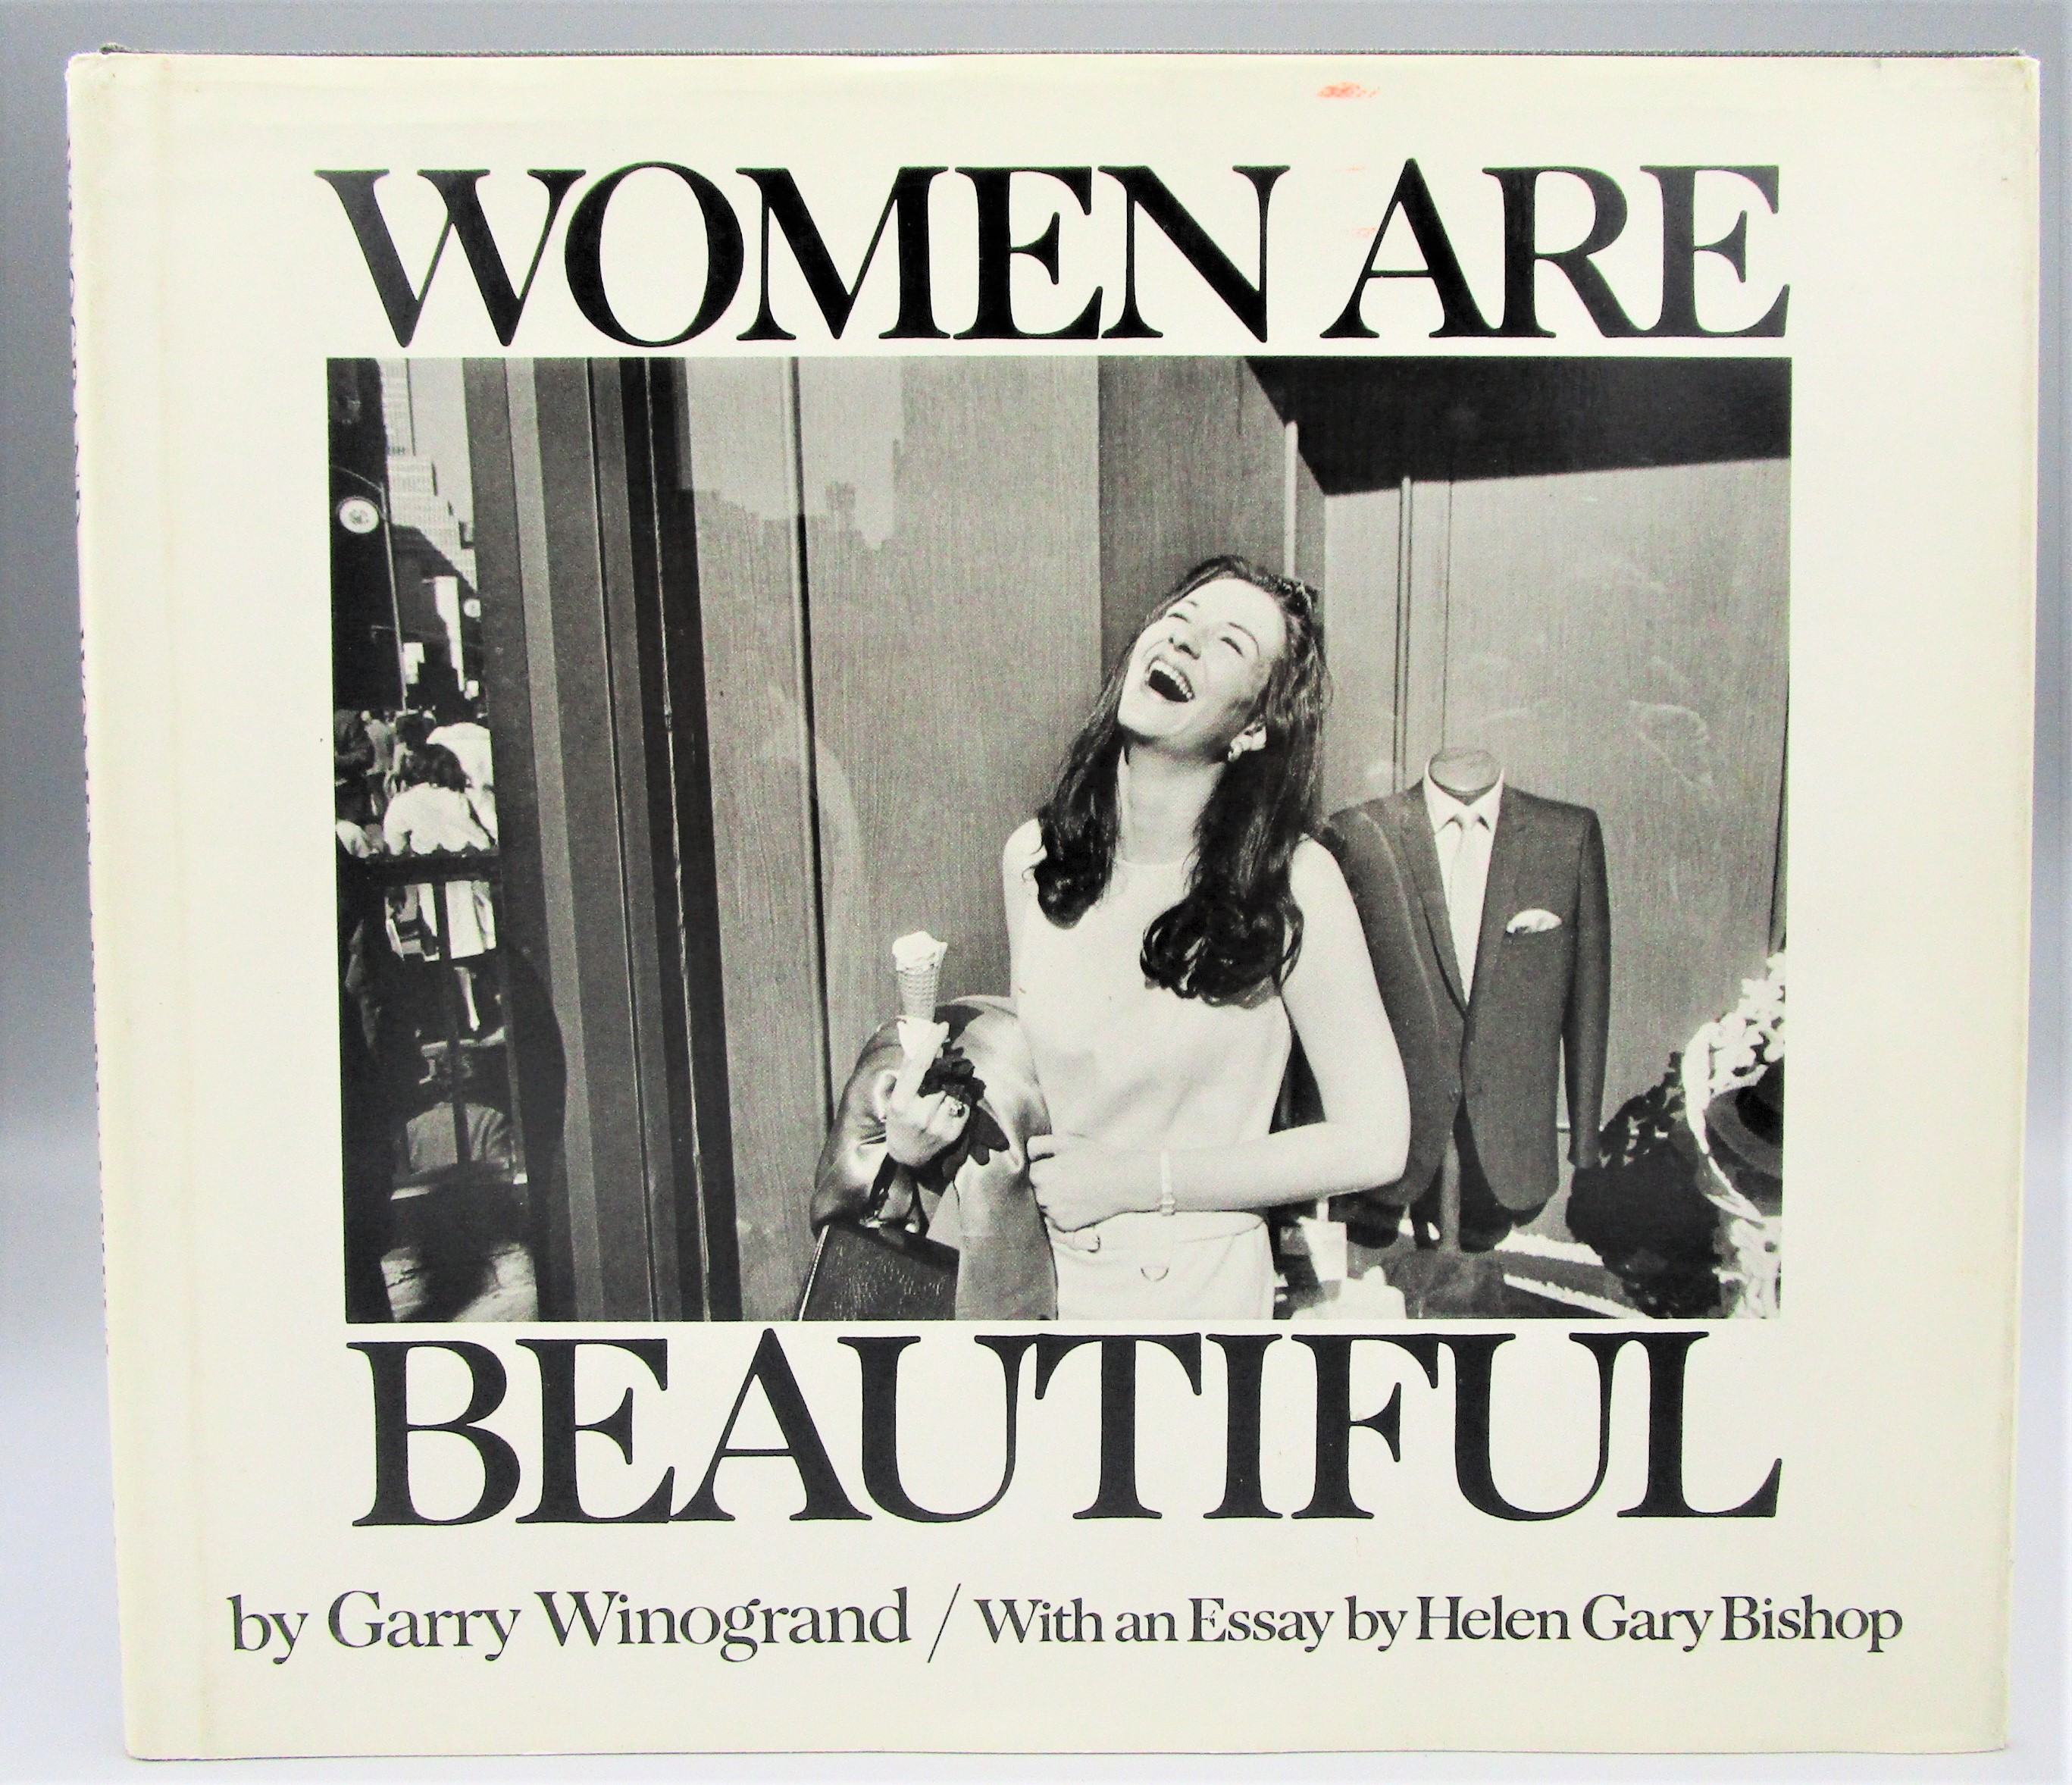 WOMEN ARE BEAUTIFUL, by Garry Winogrand - 1975 [1st Ed]